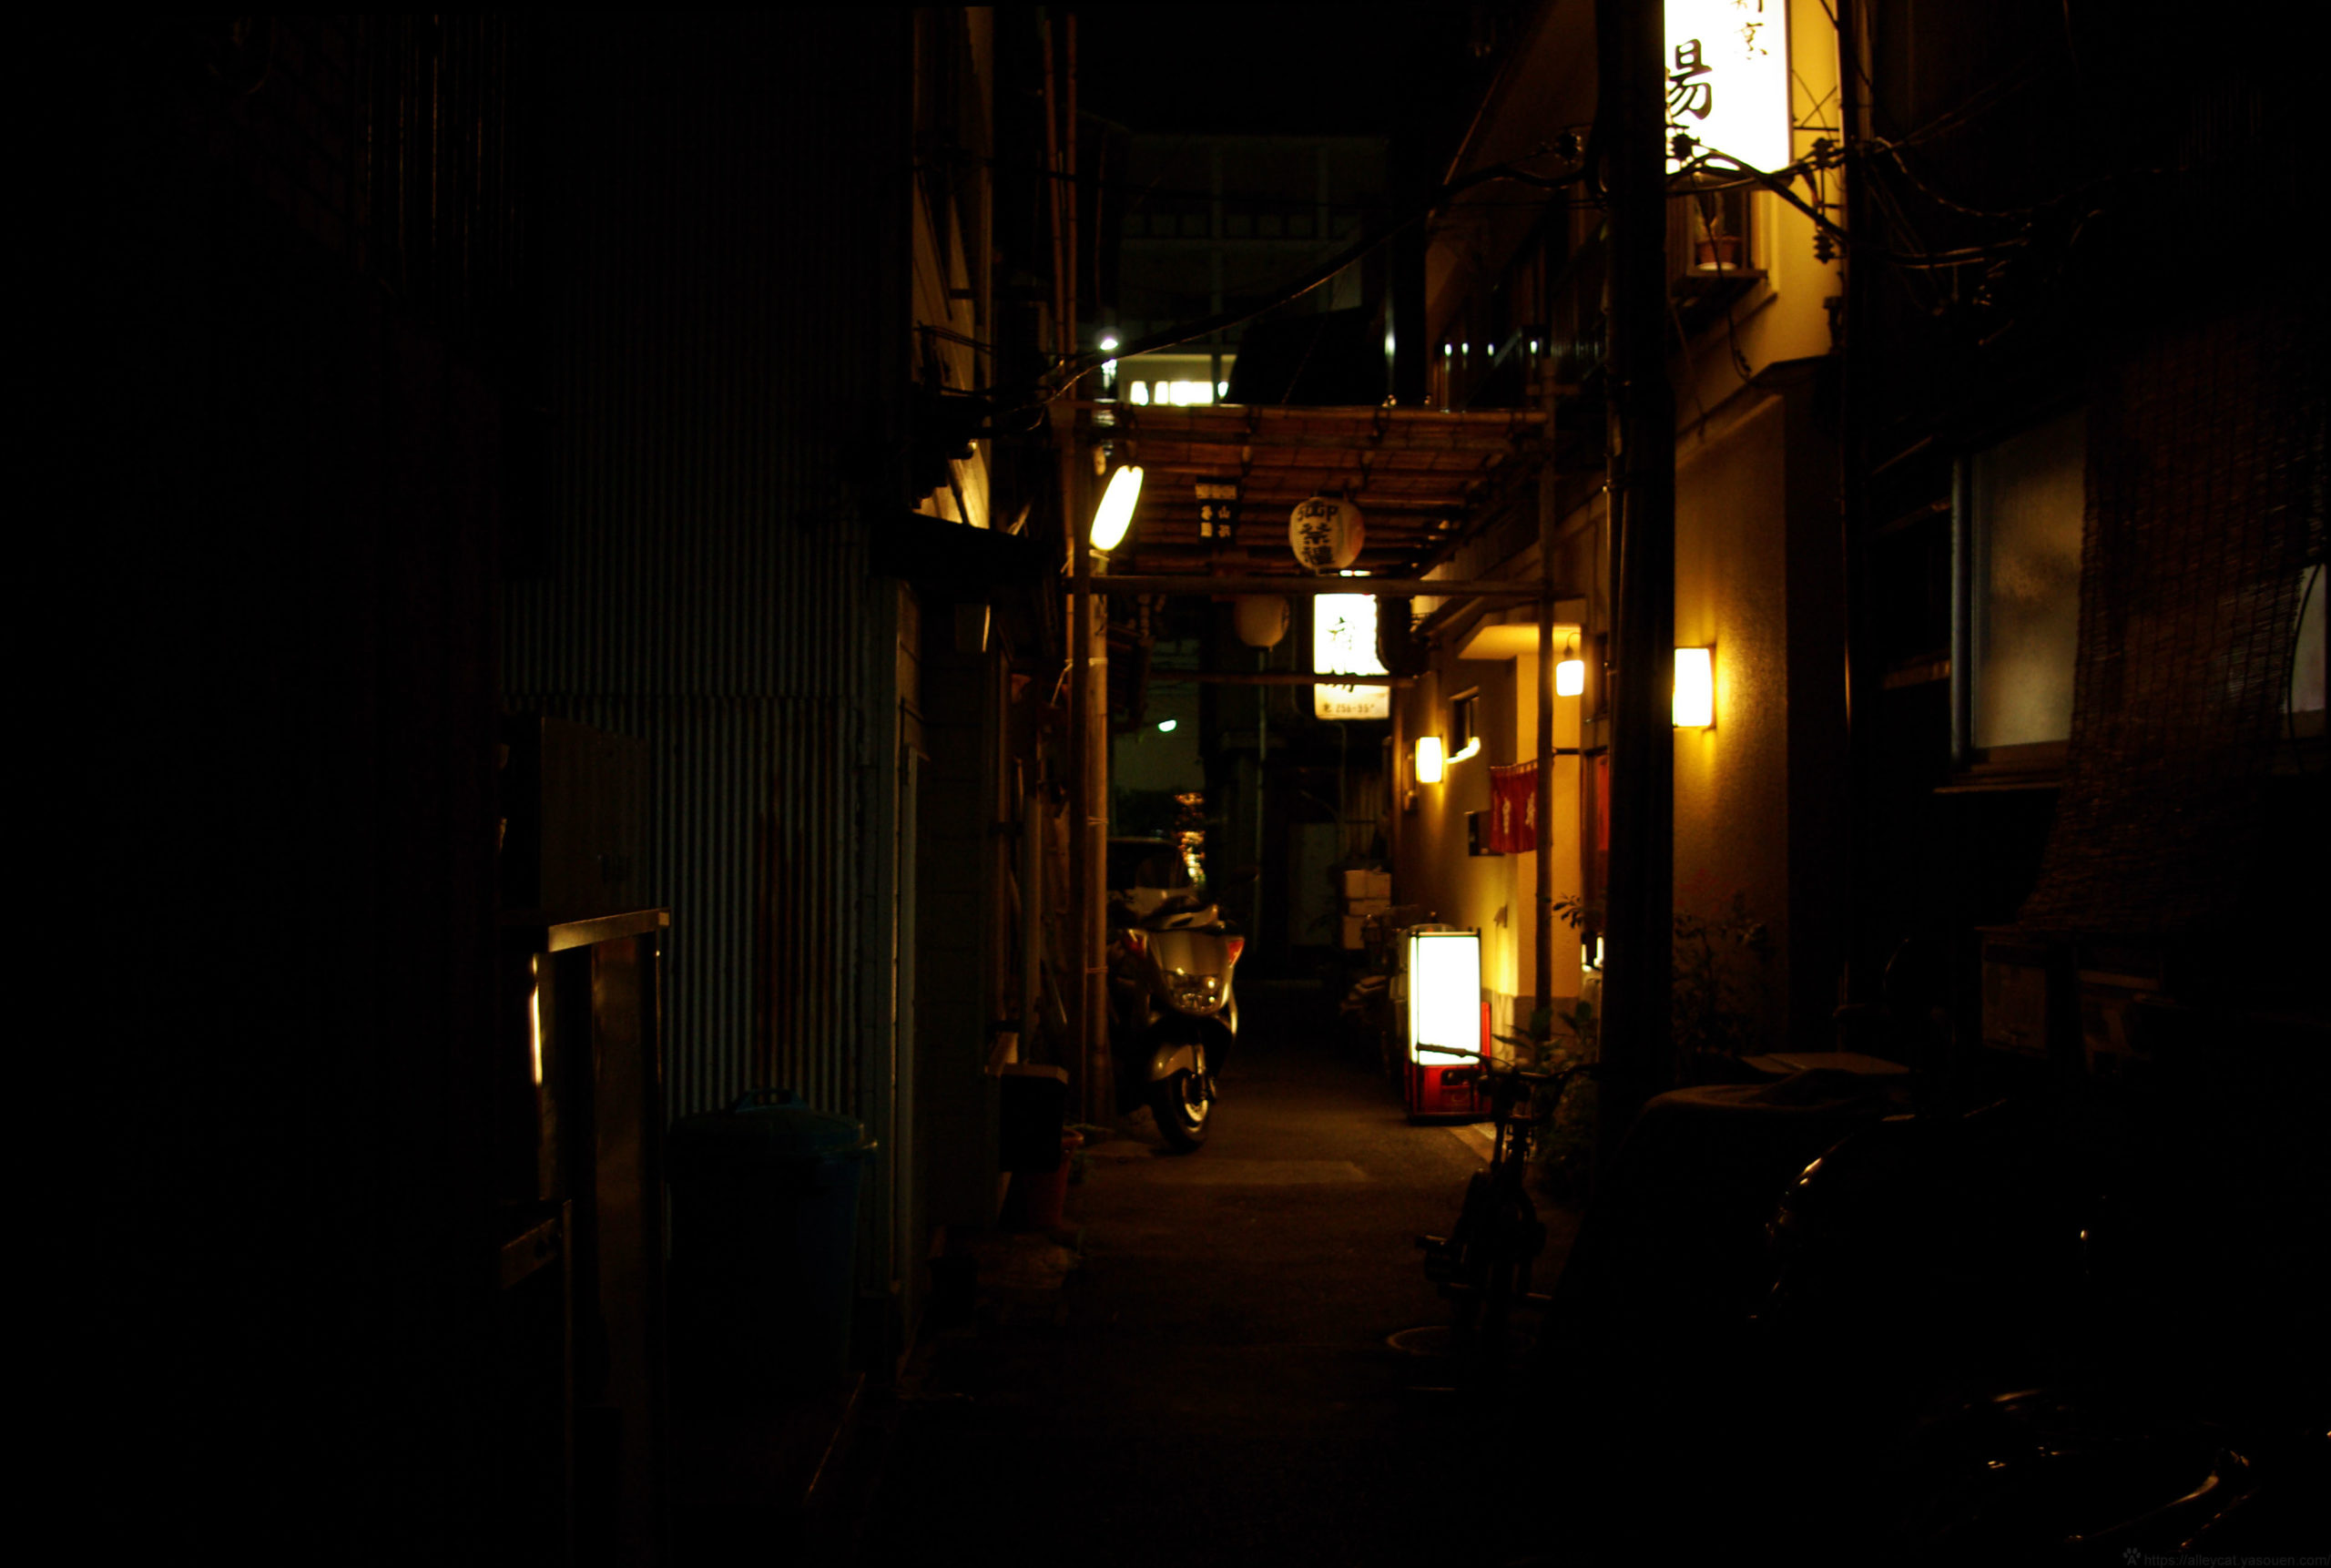 Tokyo, Japan, 2007